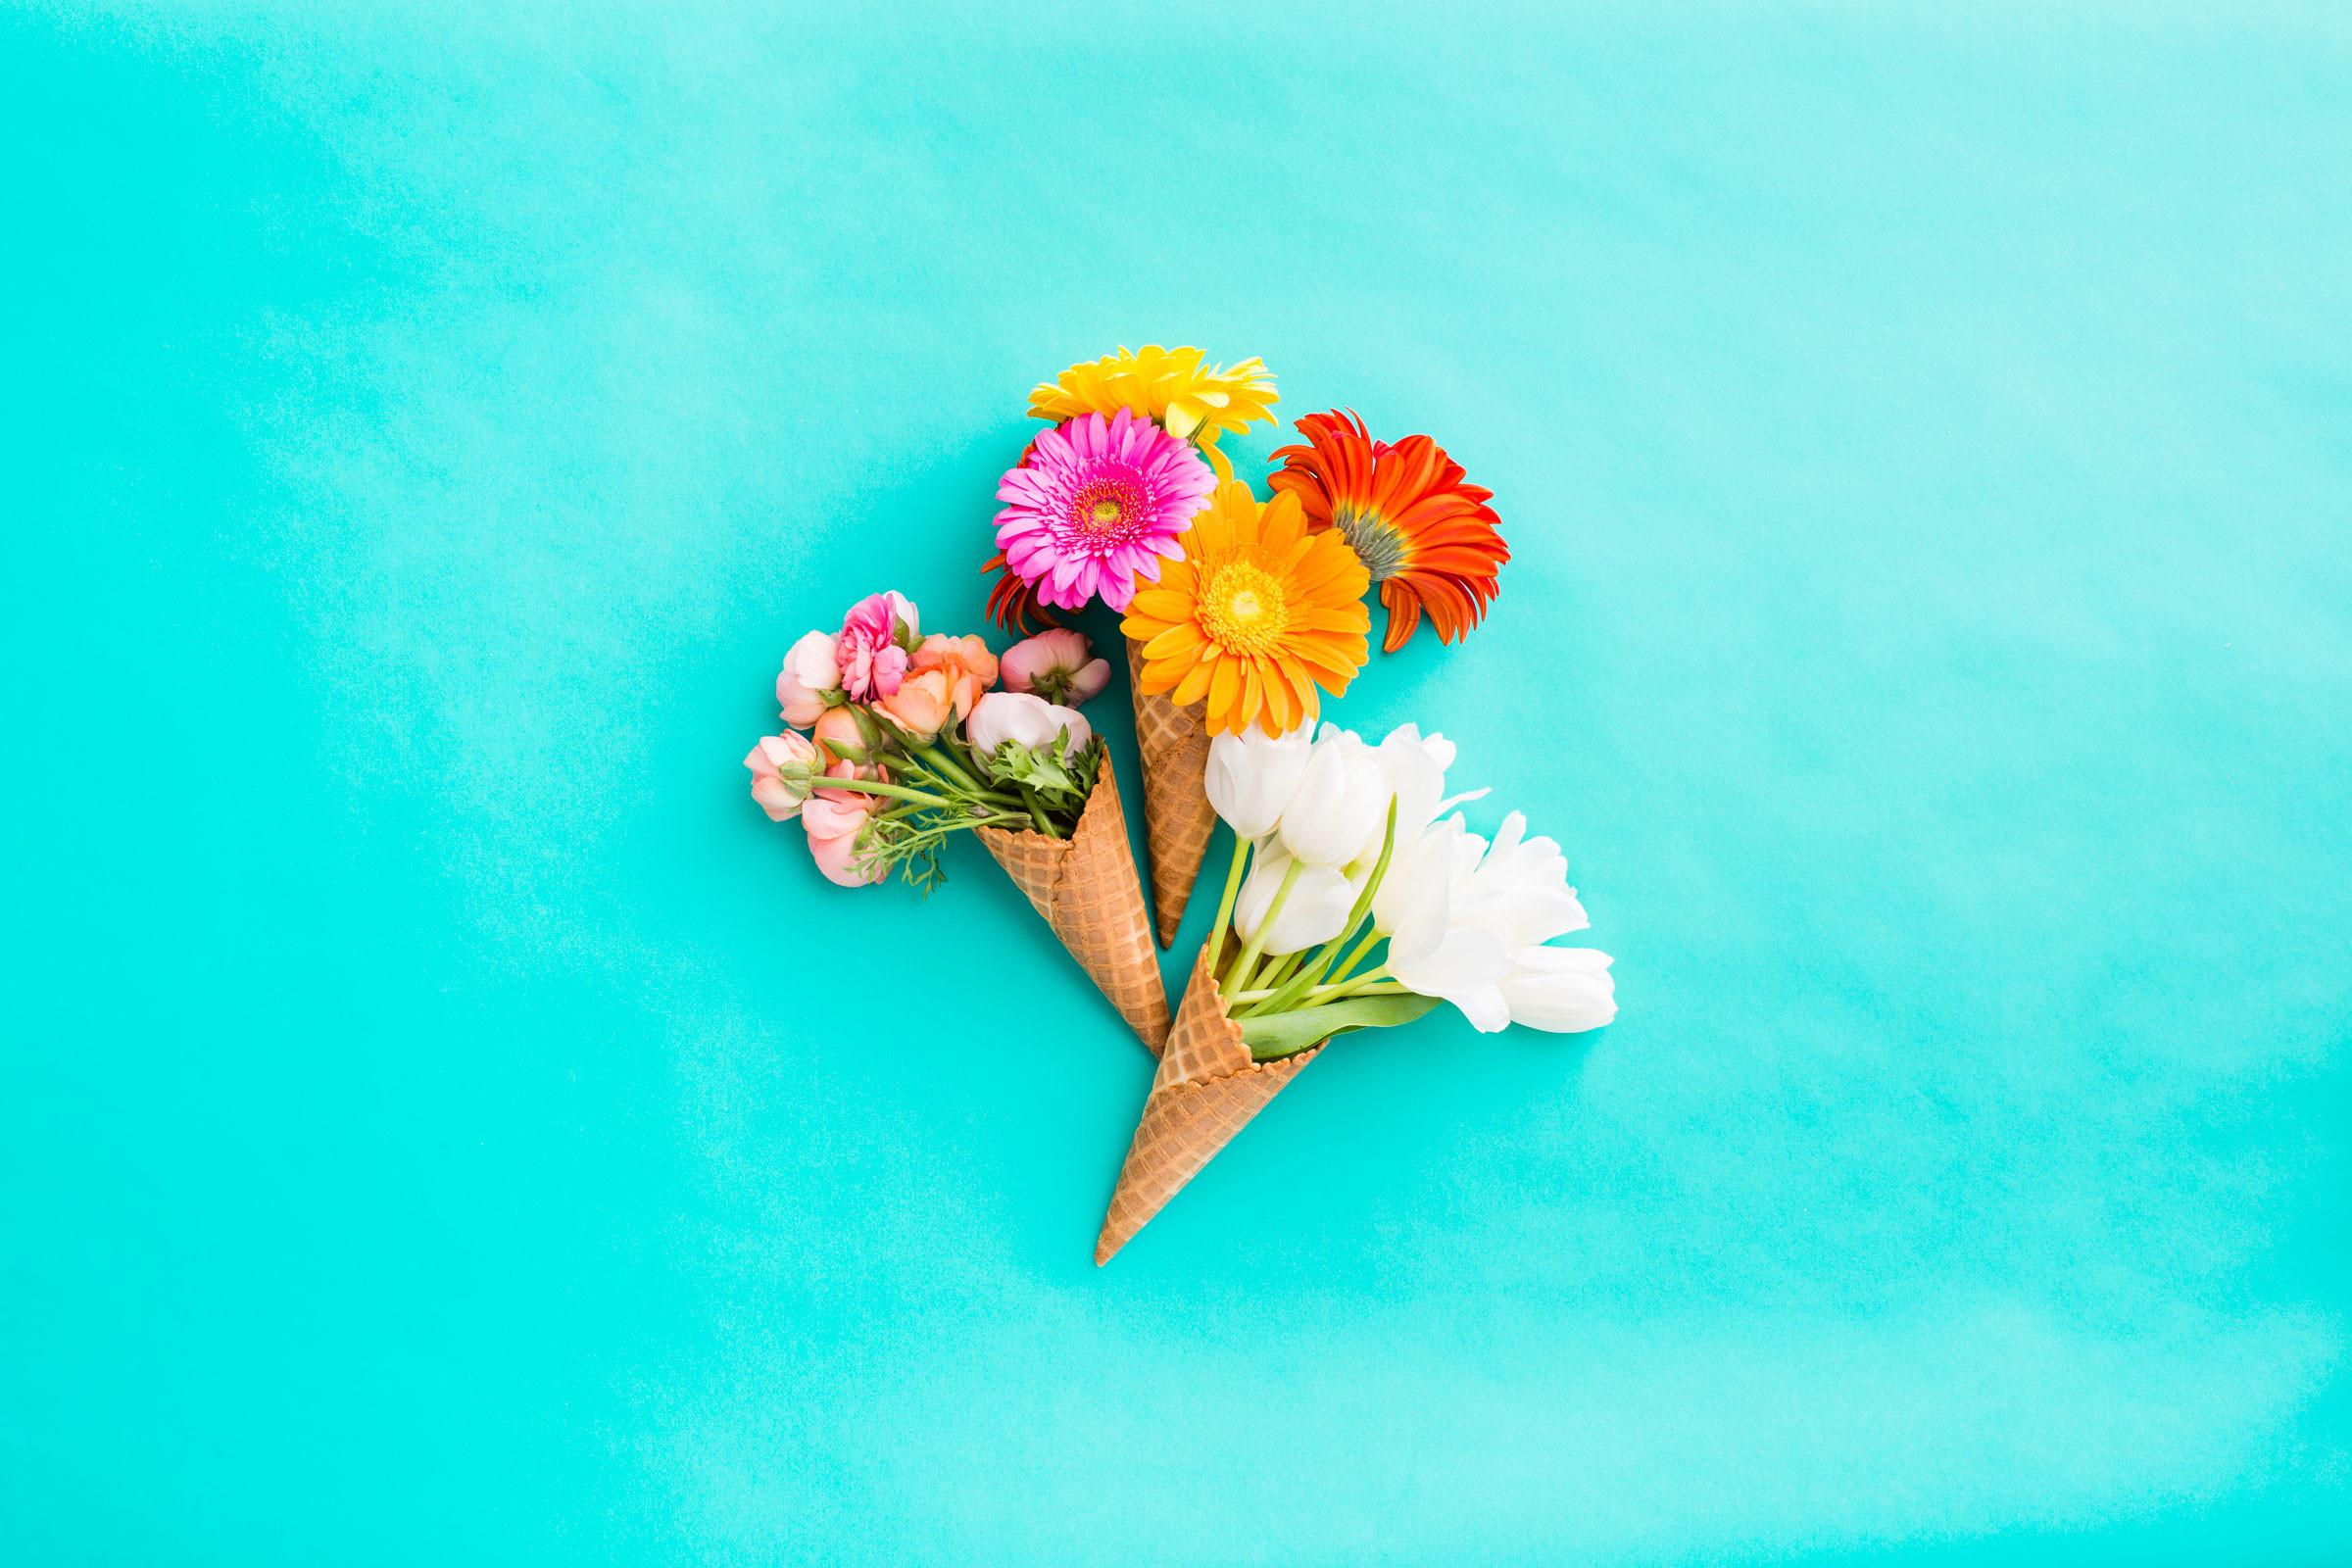 Download Floral Bunch of Ice Cream Cones